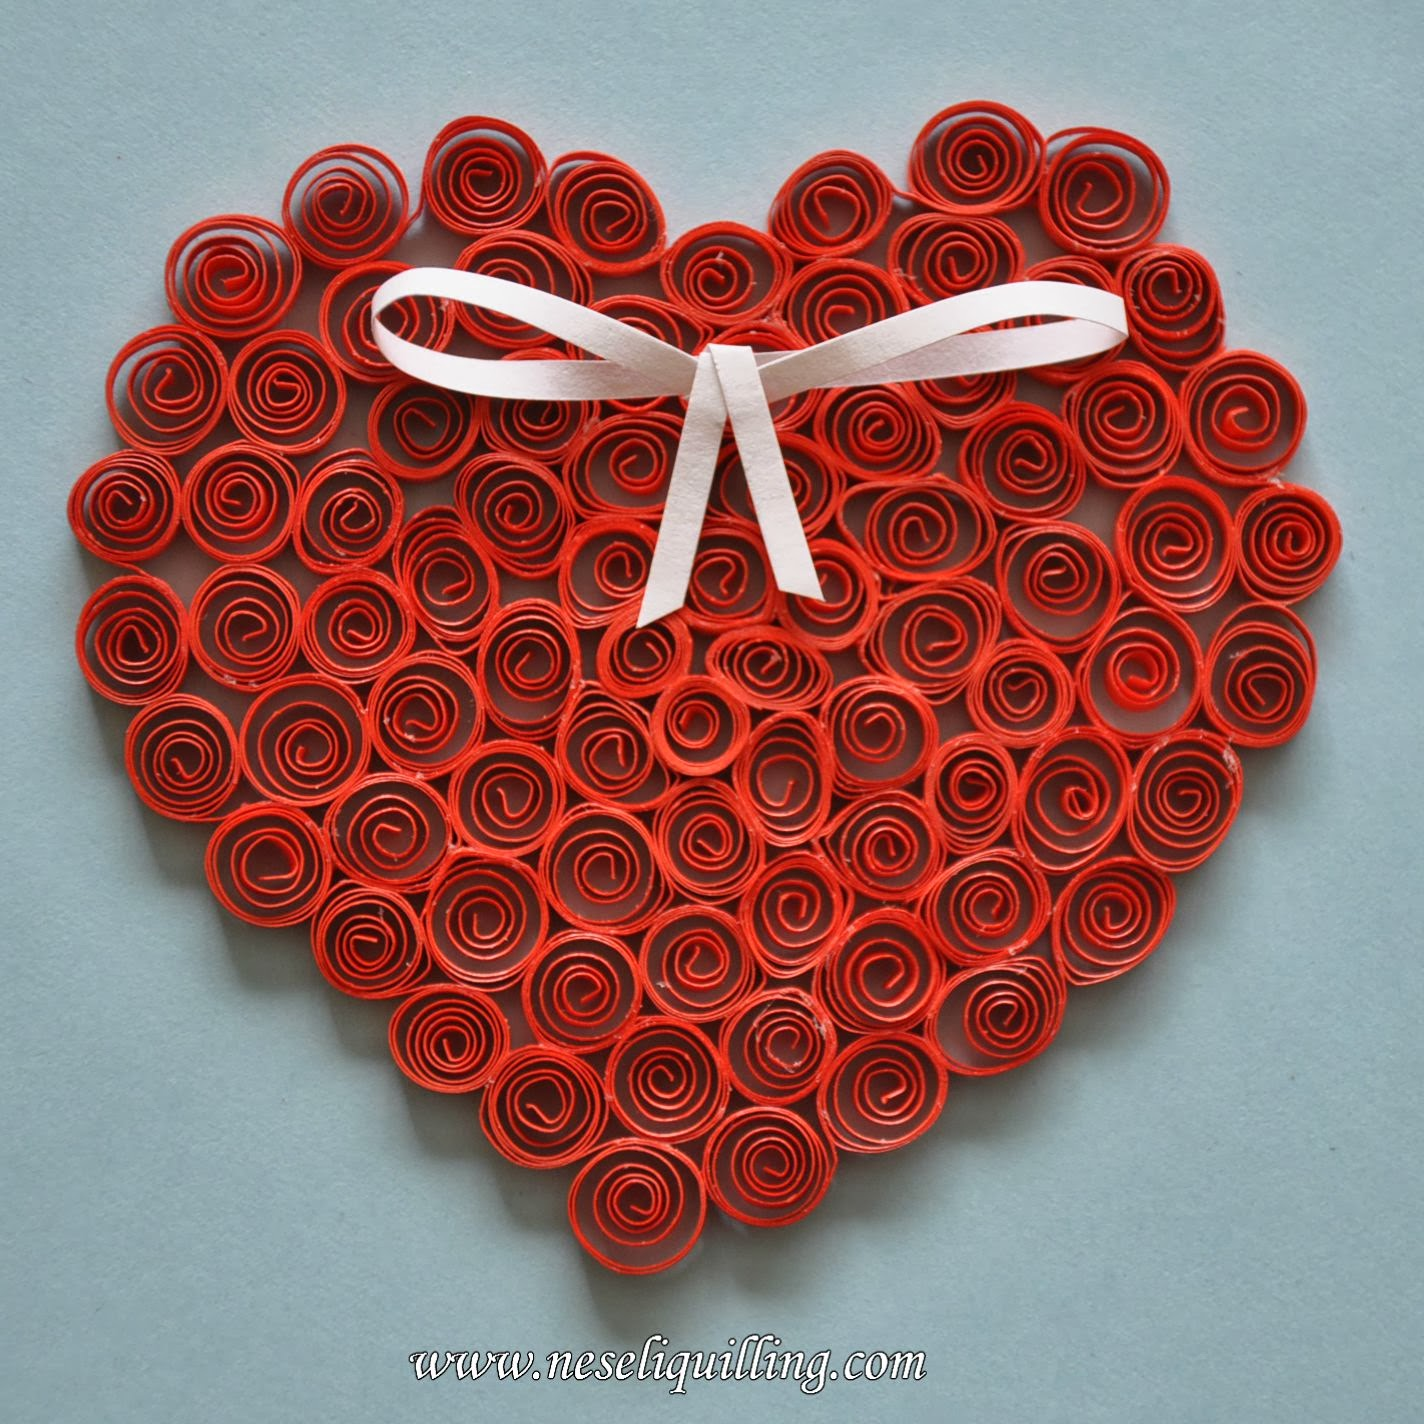 nesli quilling heart